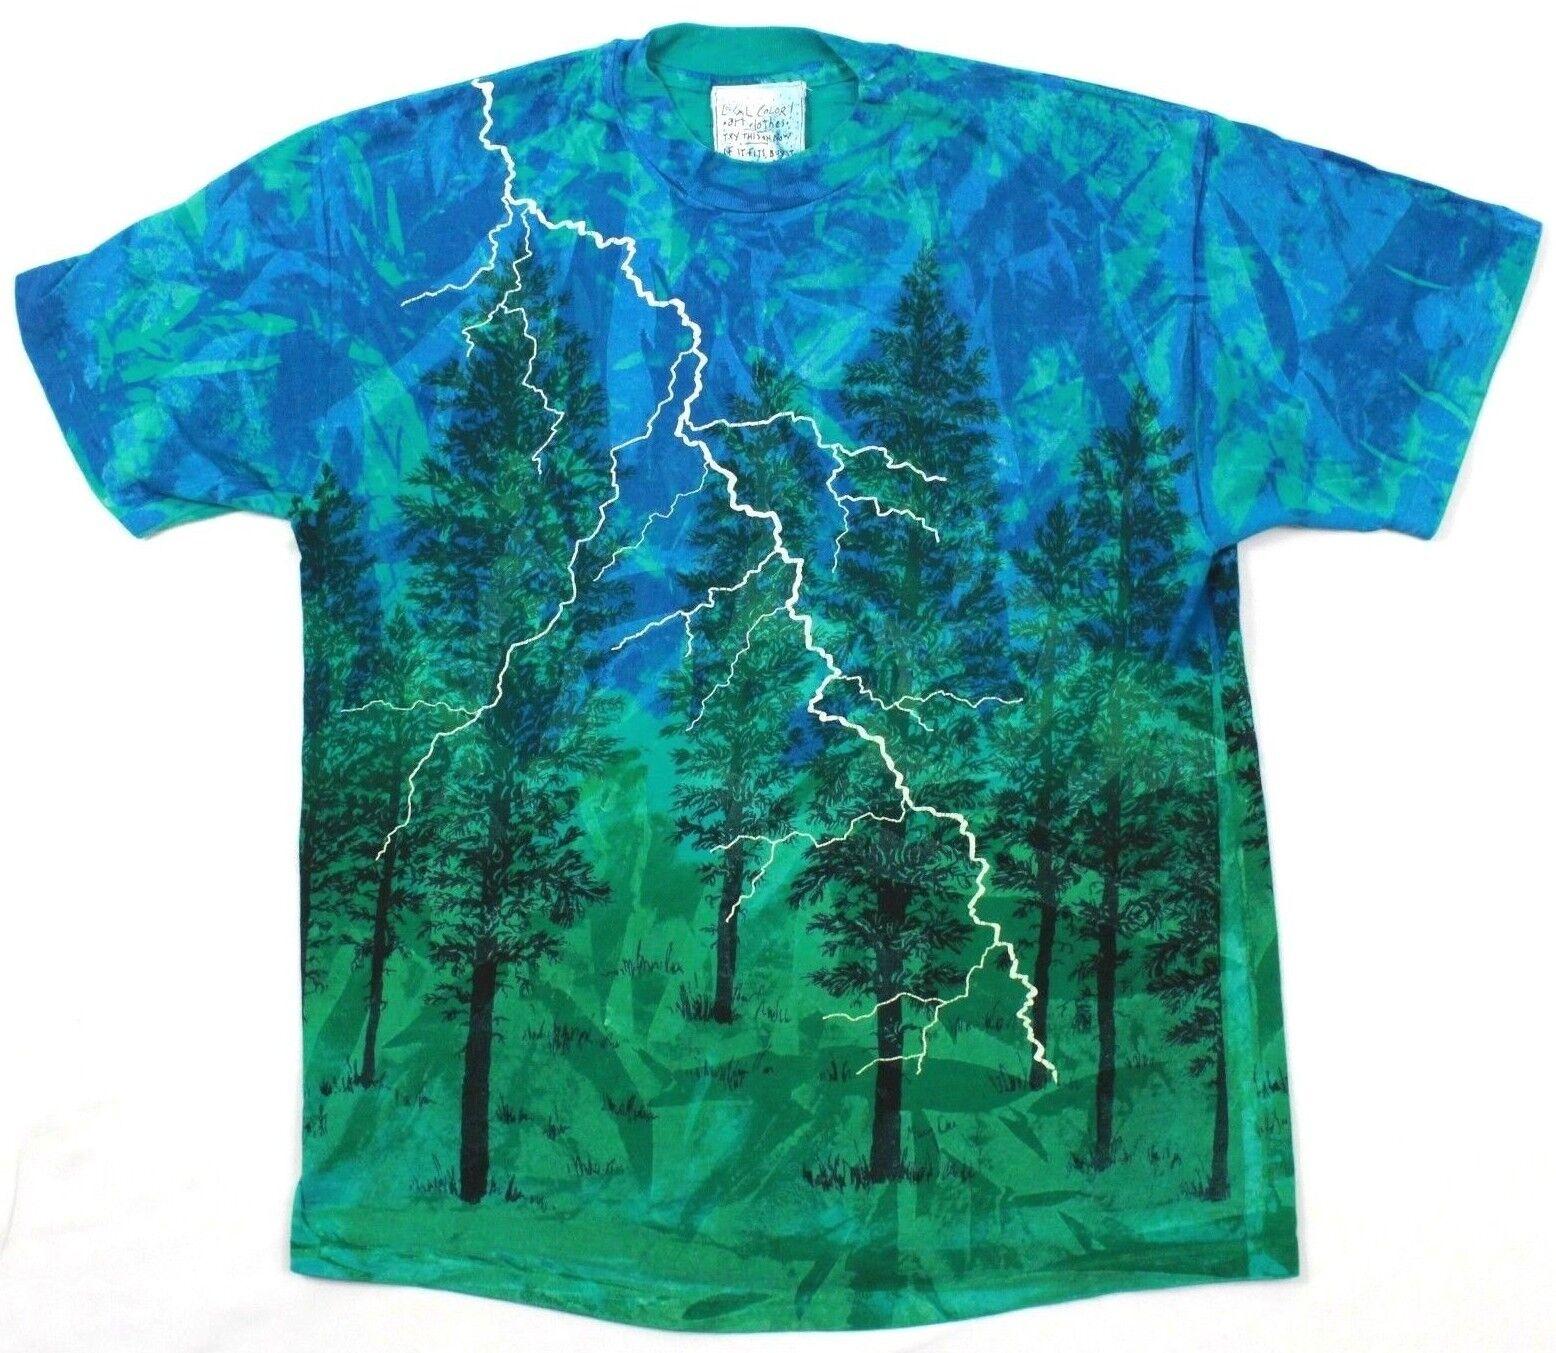 24.4ms Farbe Kunst Kleidung T-Shirt Künstler Signiert Landschaft Batik Einzel